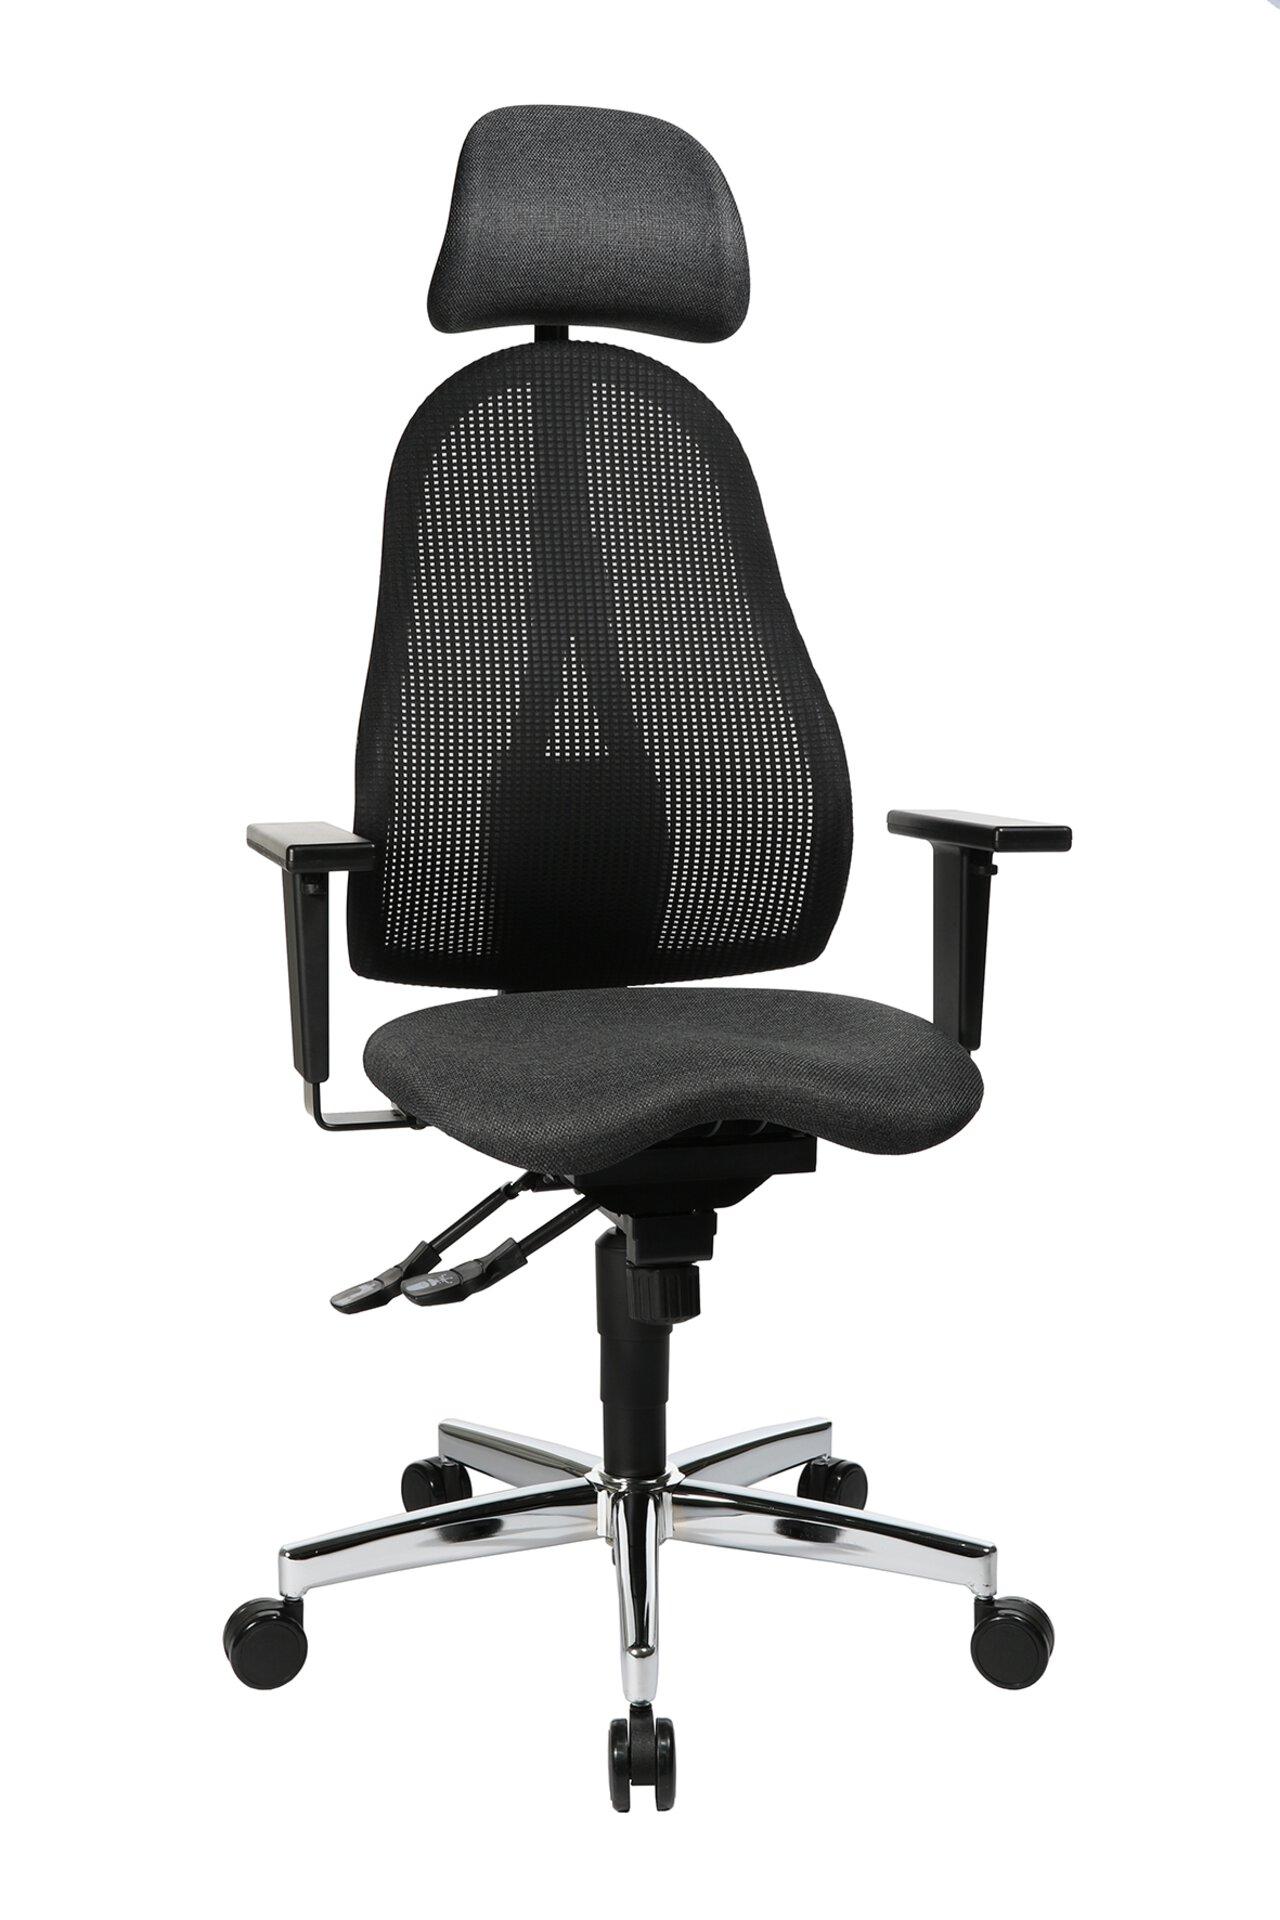 Büro-Drehstuhl SITNESS PROFI 650 Topstar Textil schwarz 54 x 140 x 58 cm